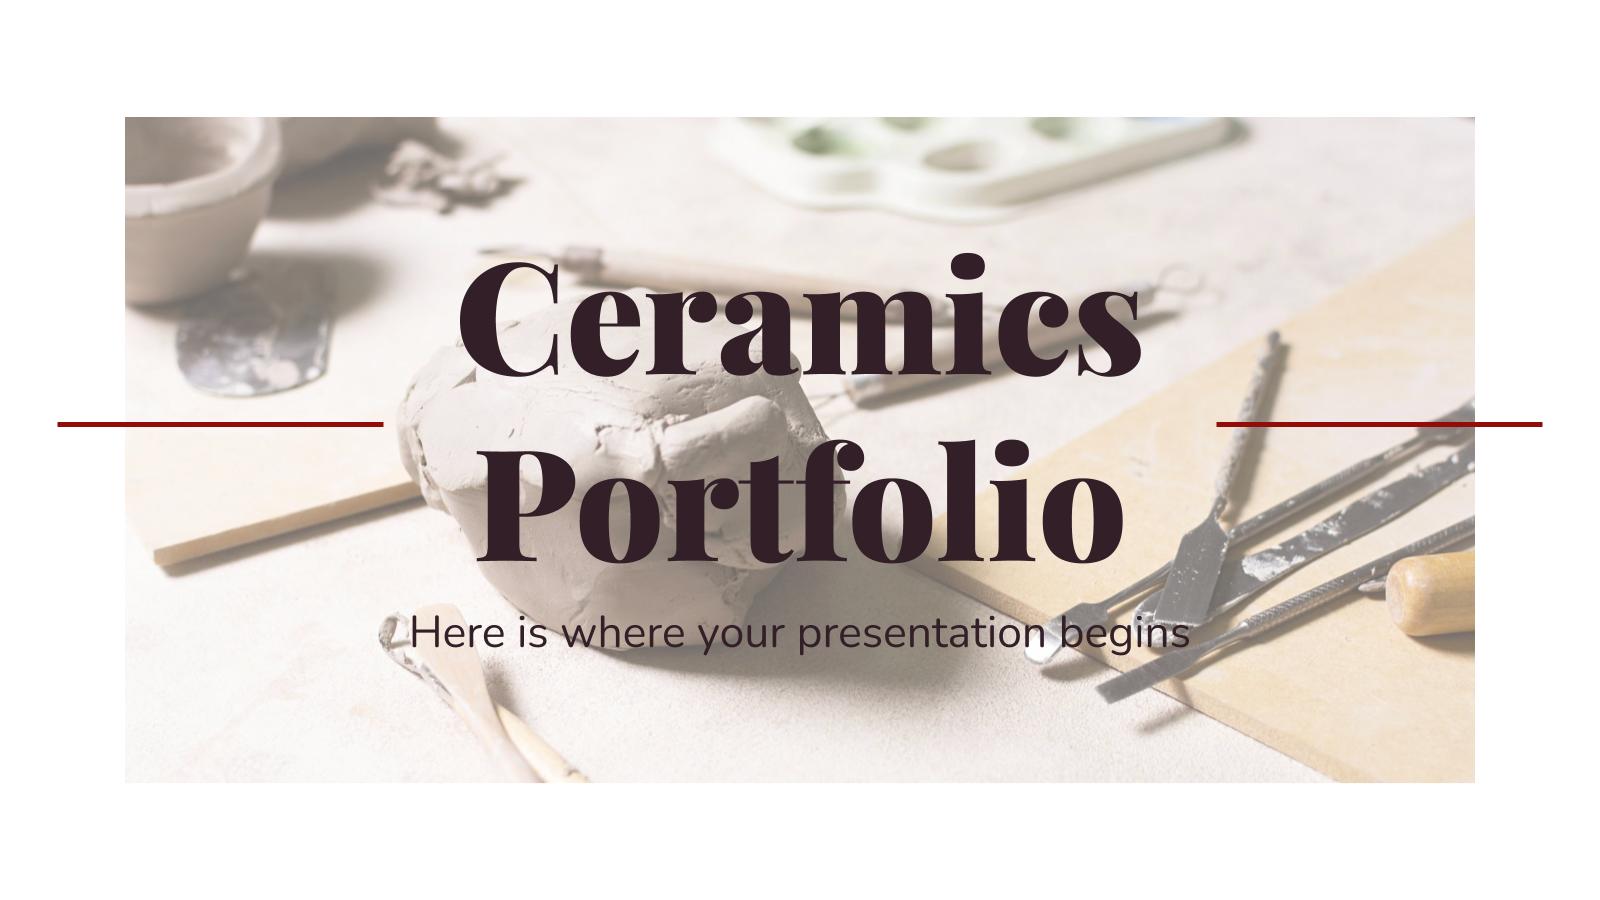 Ceramics Portfolio presentation template